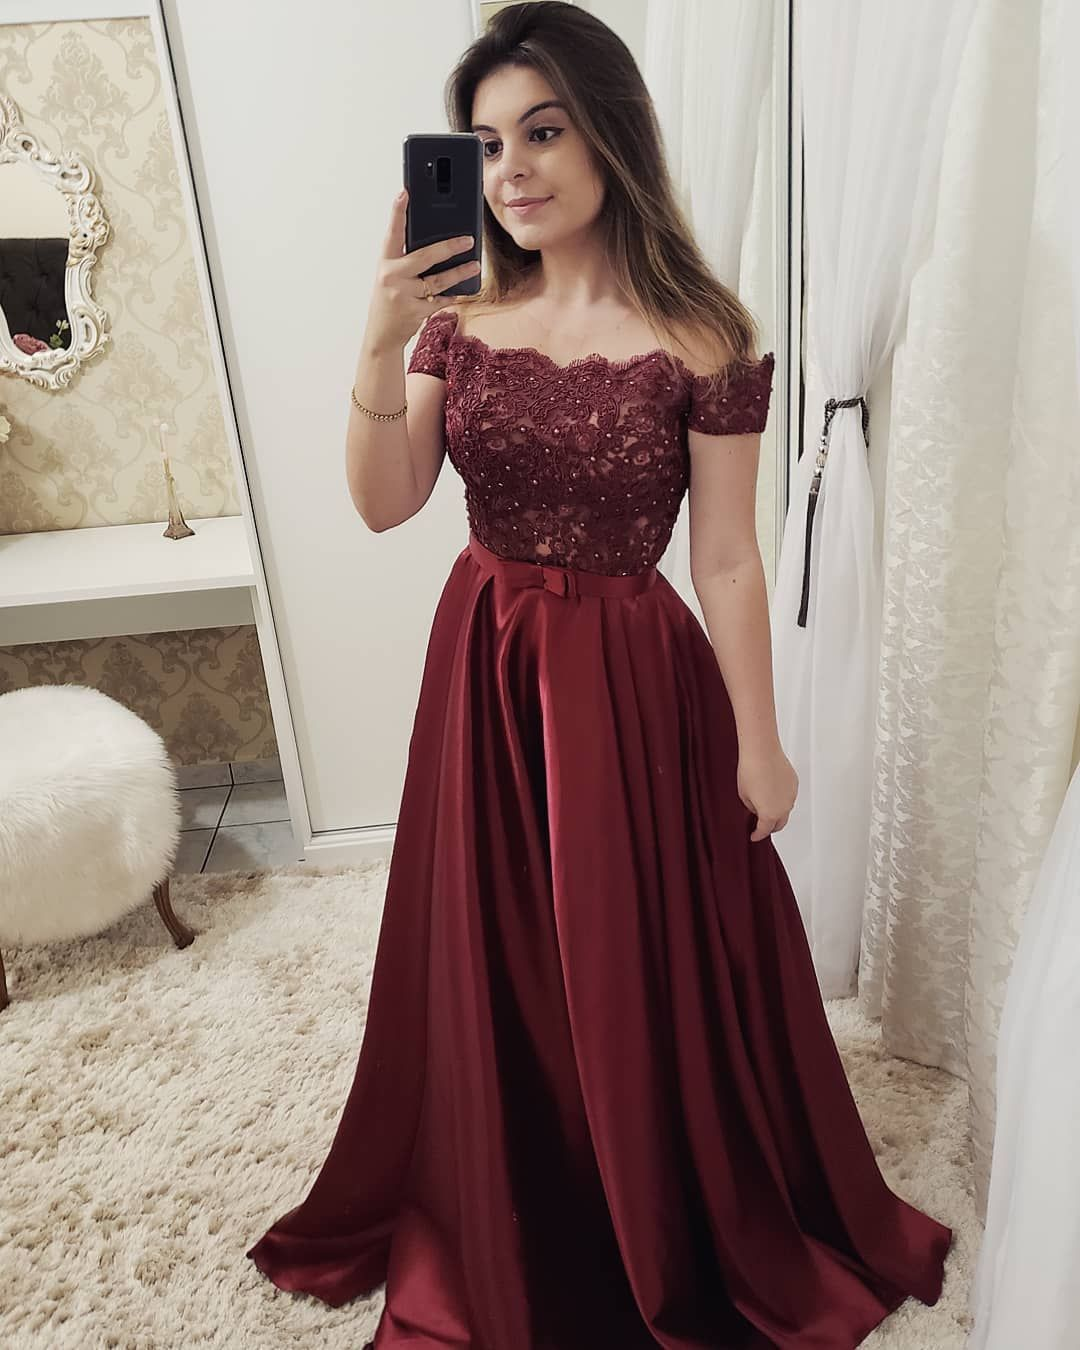 Long Formal Sleeve Evening Dresses Color Vestido Party Evens Gowns,Burgundy,8,Floor Length